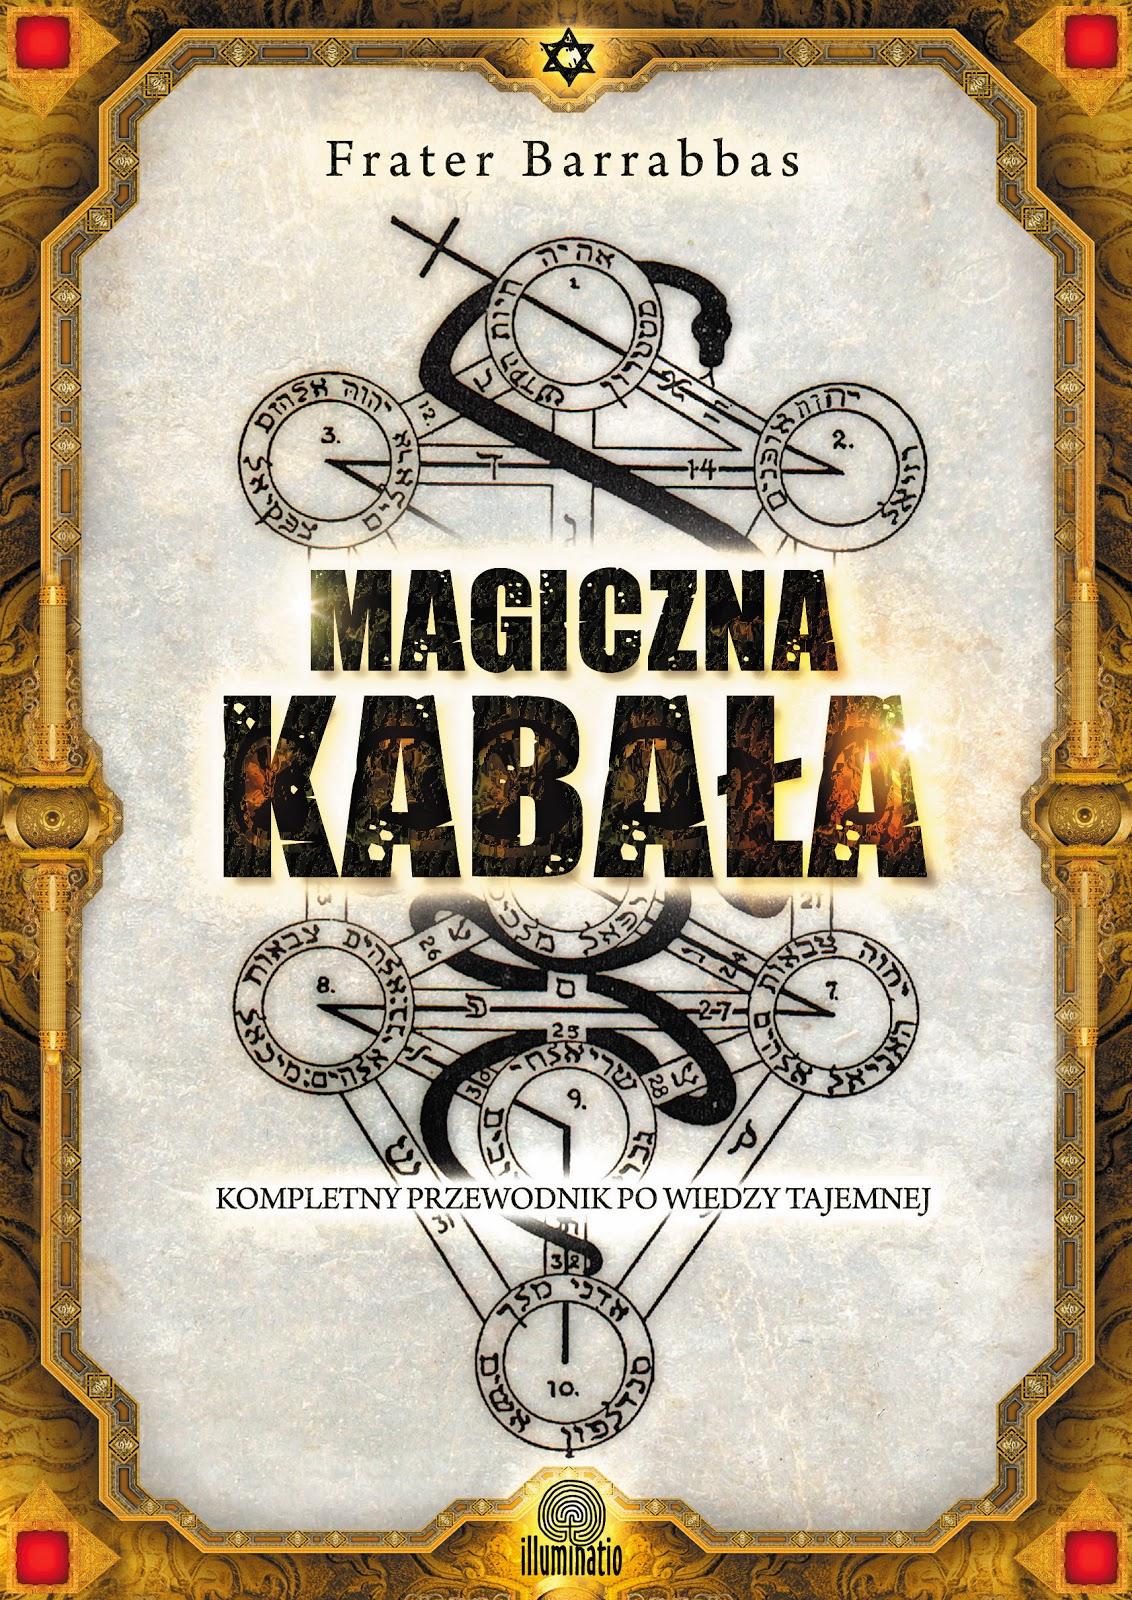 http://www.illuminatio.pl/ksiazki/magiczna-kabala/